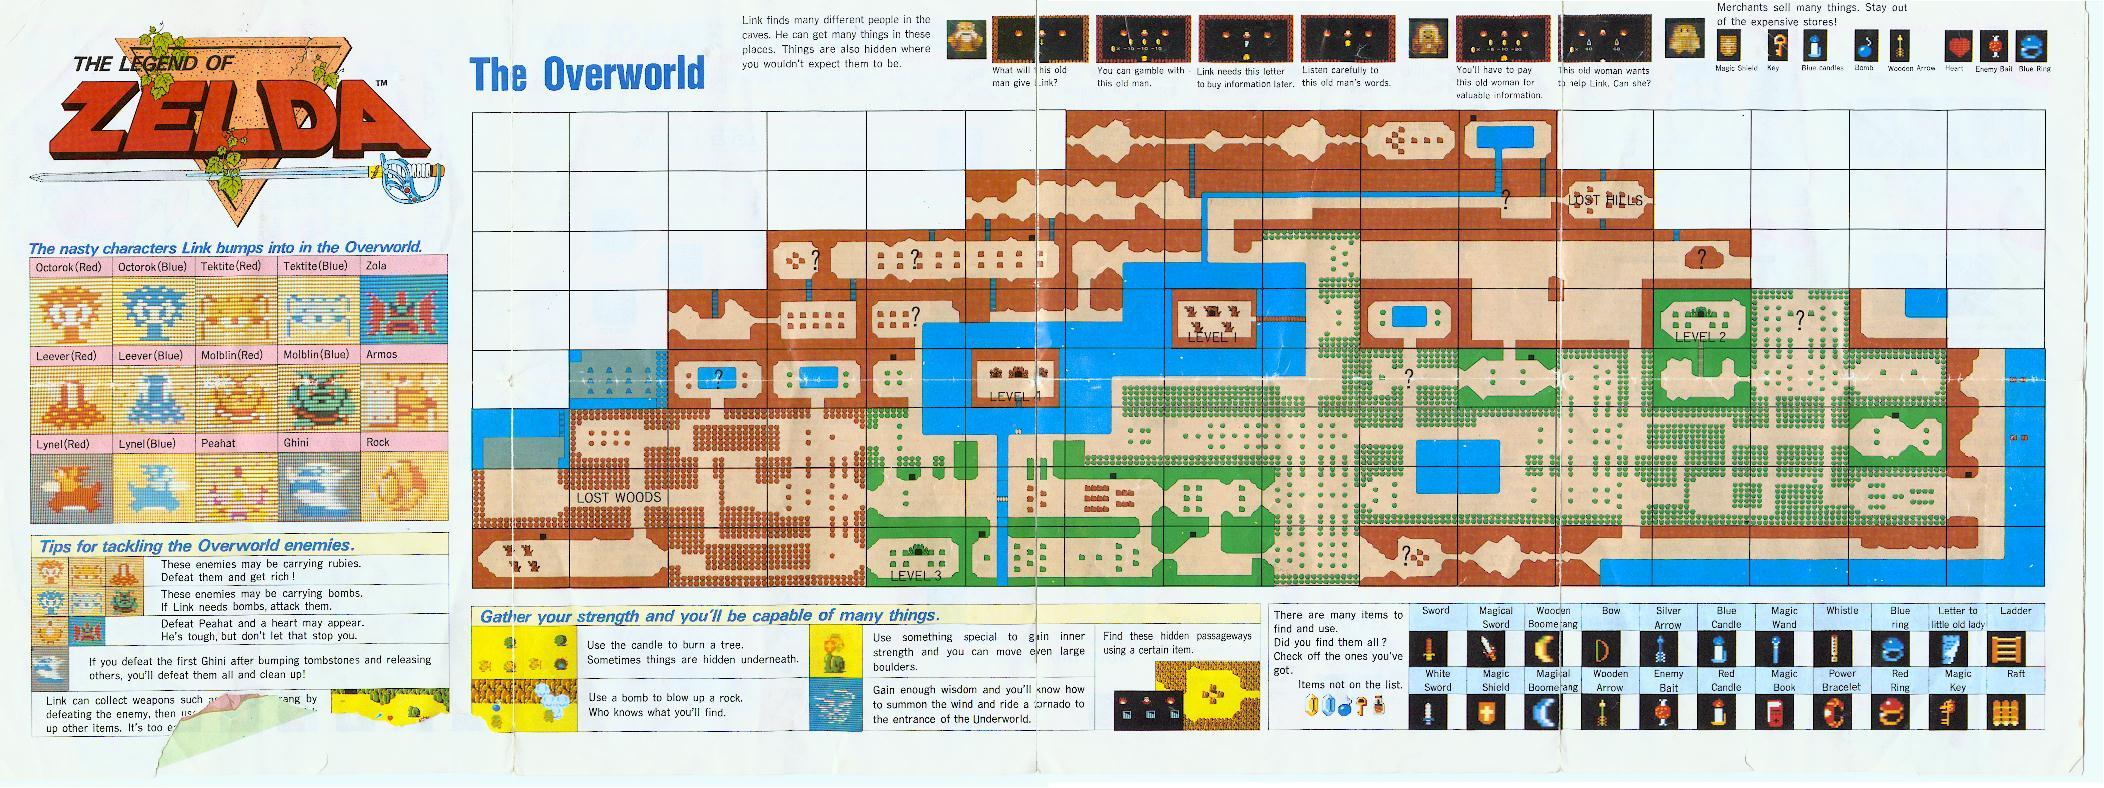 Legend Of Zelda The The Overworld Map For Nes Original